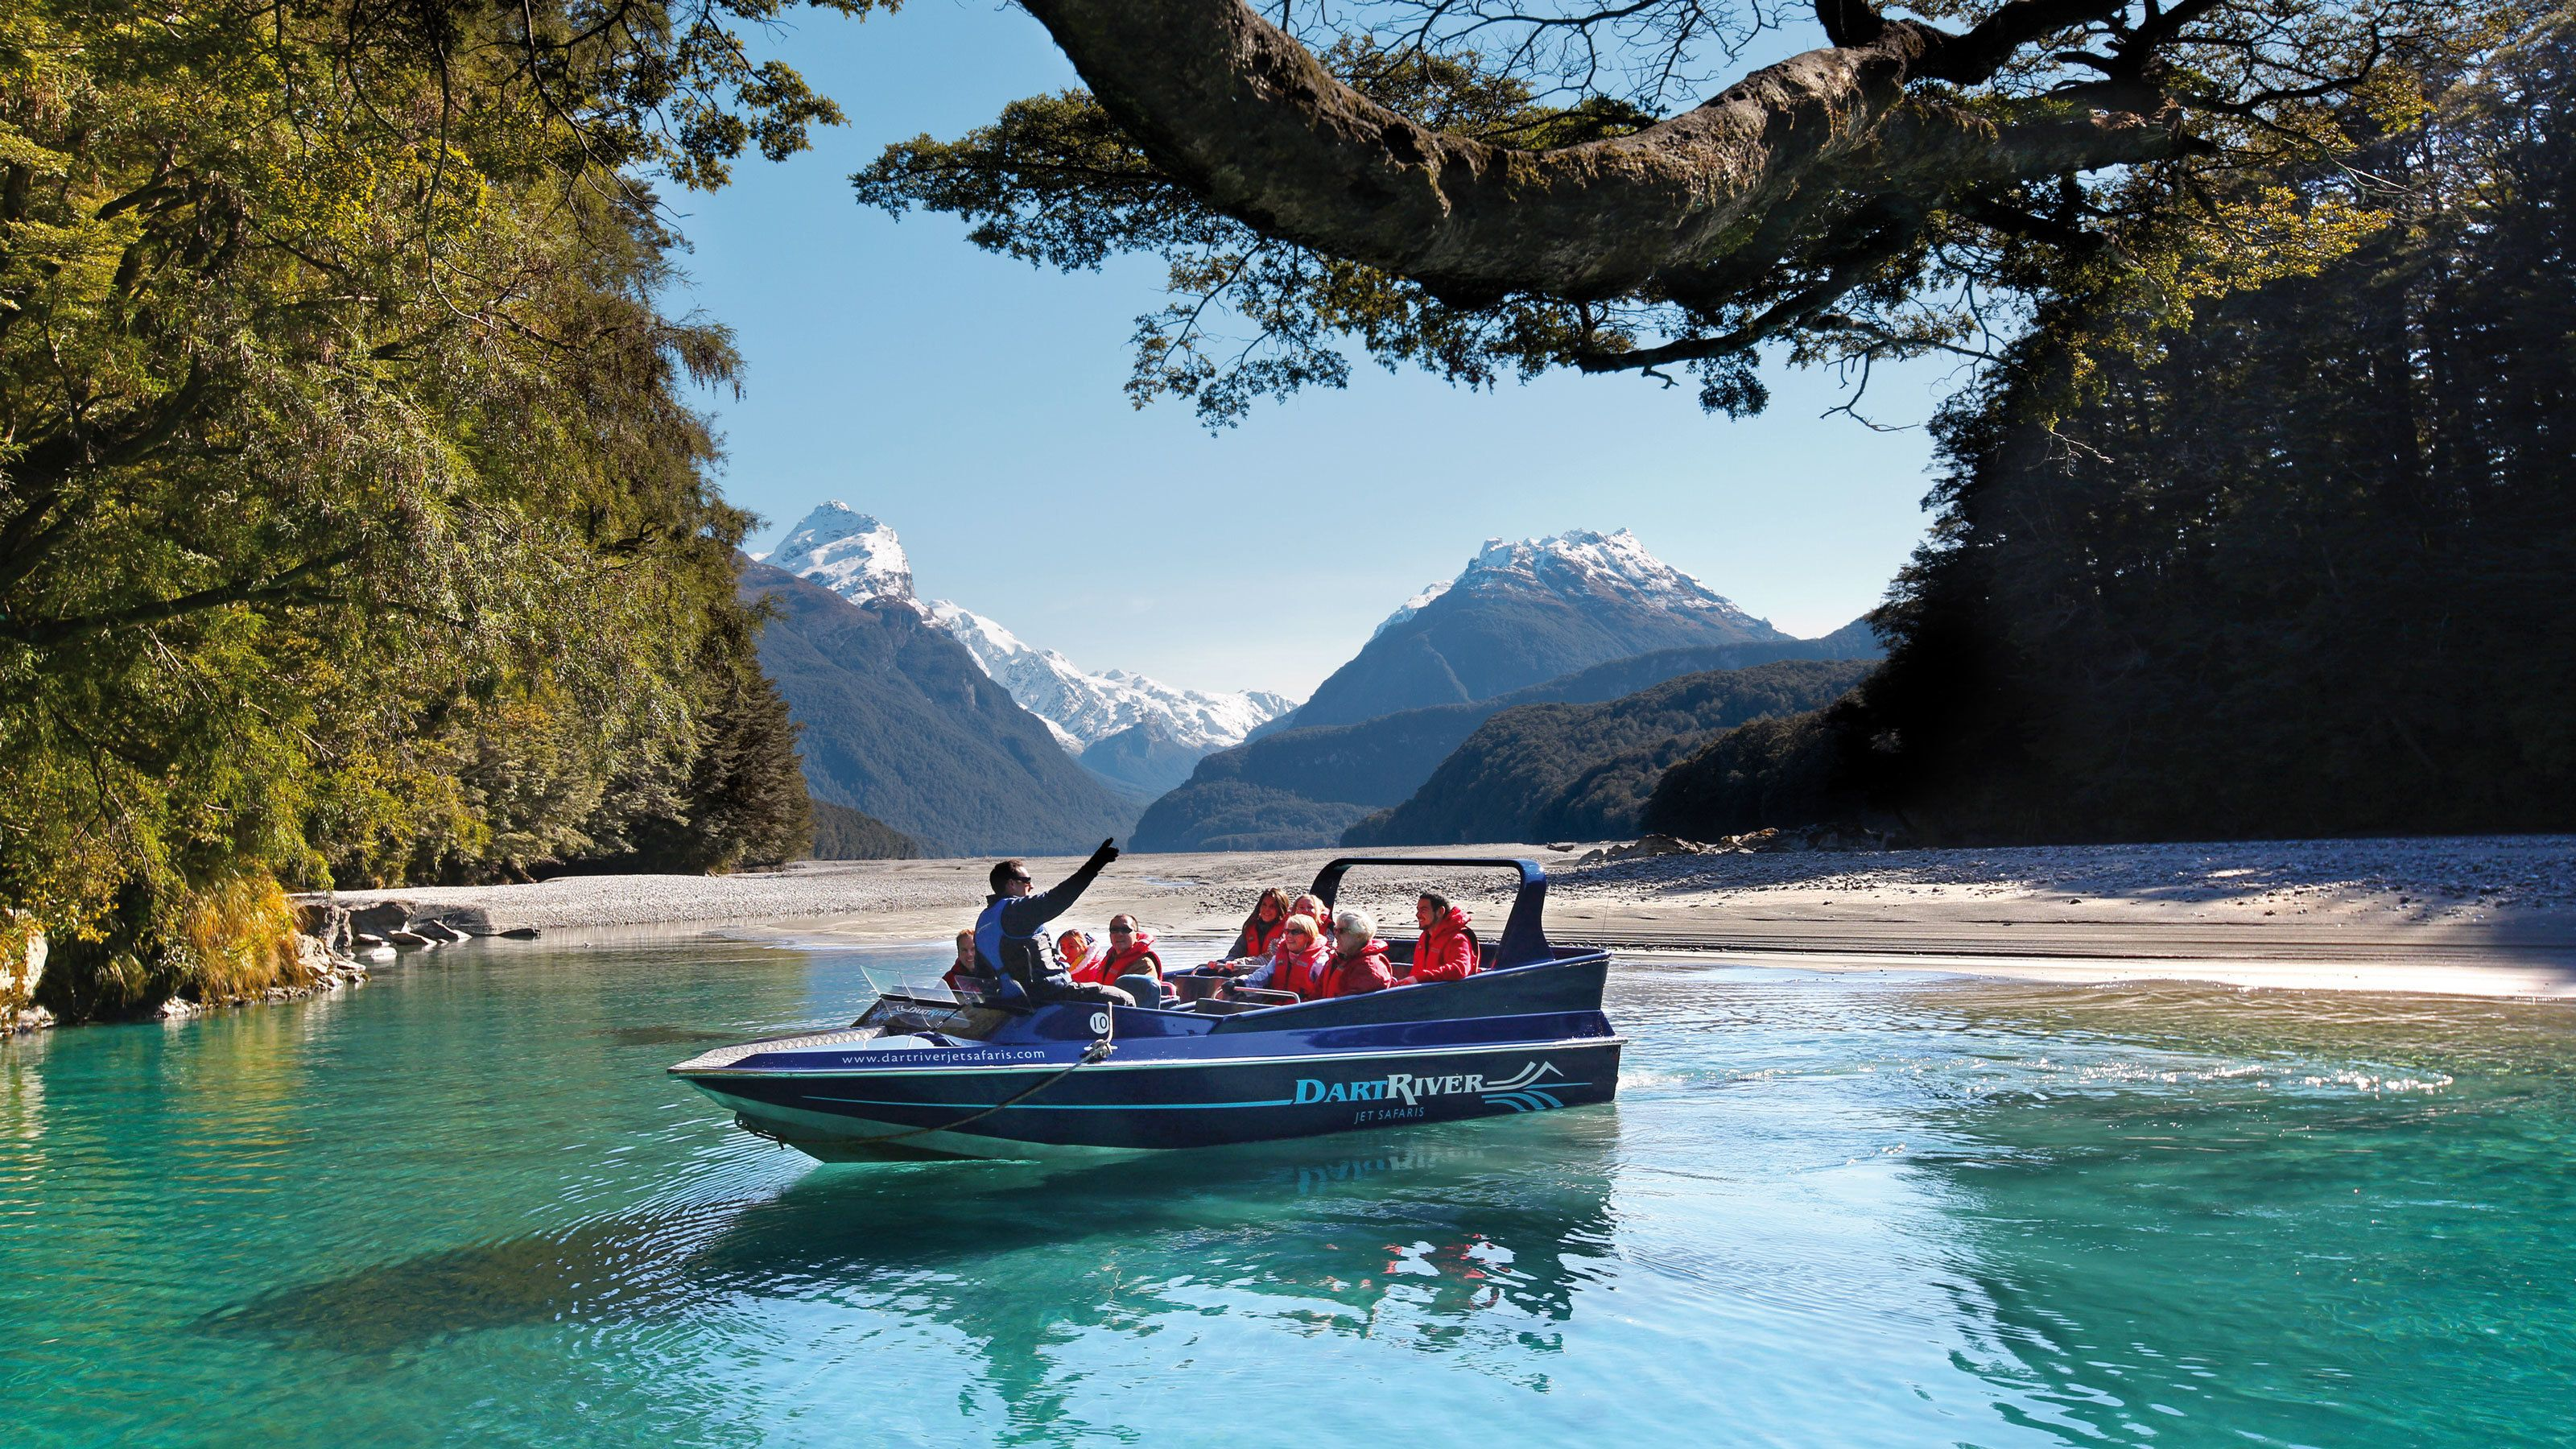 aboard the jet safari boat in New Zealand